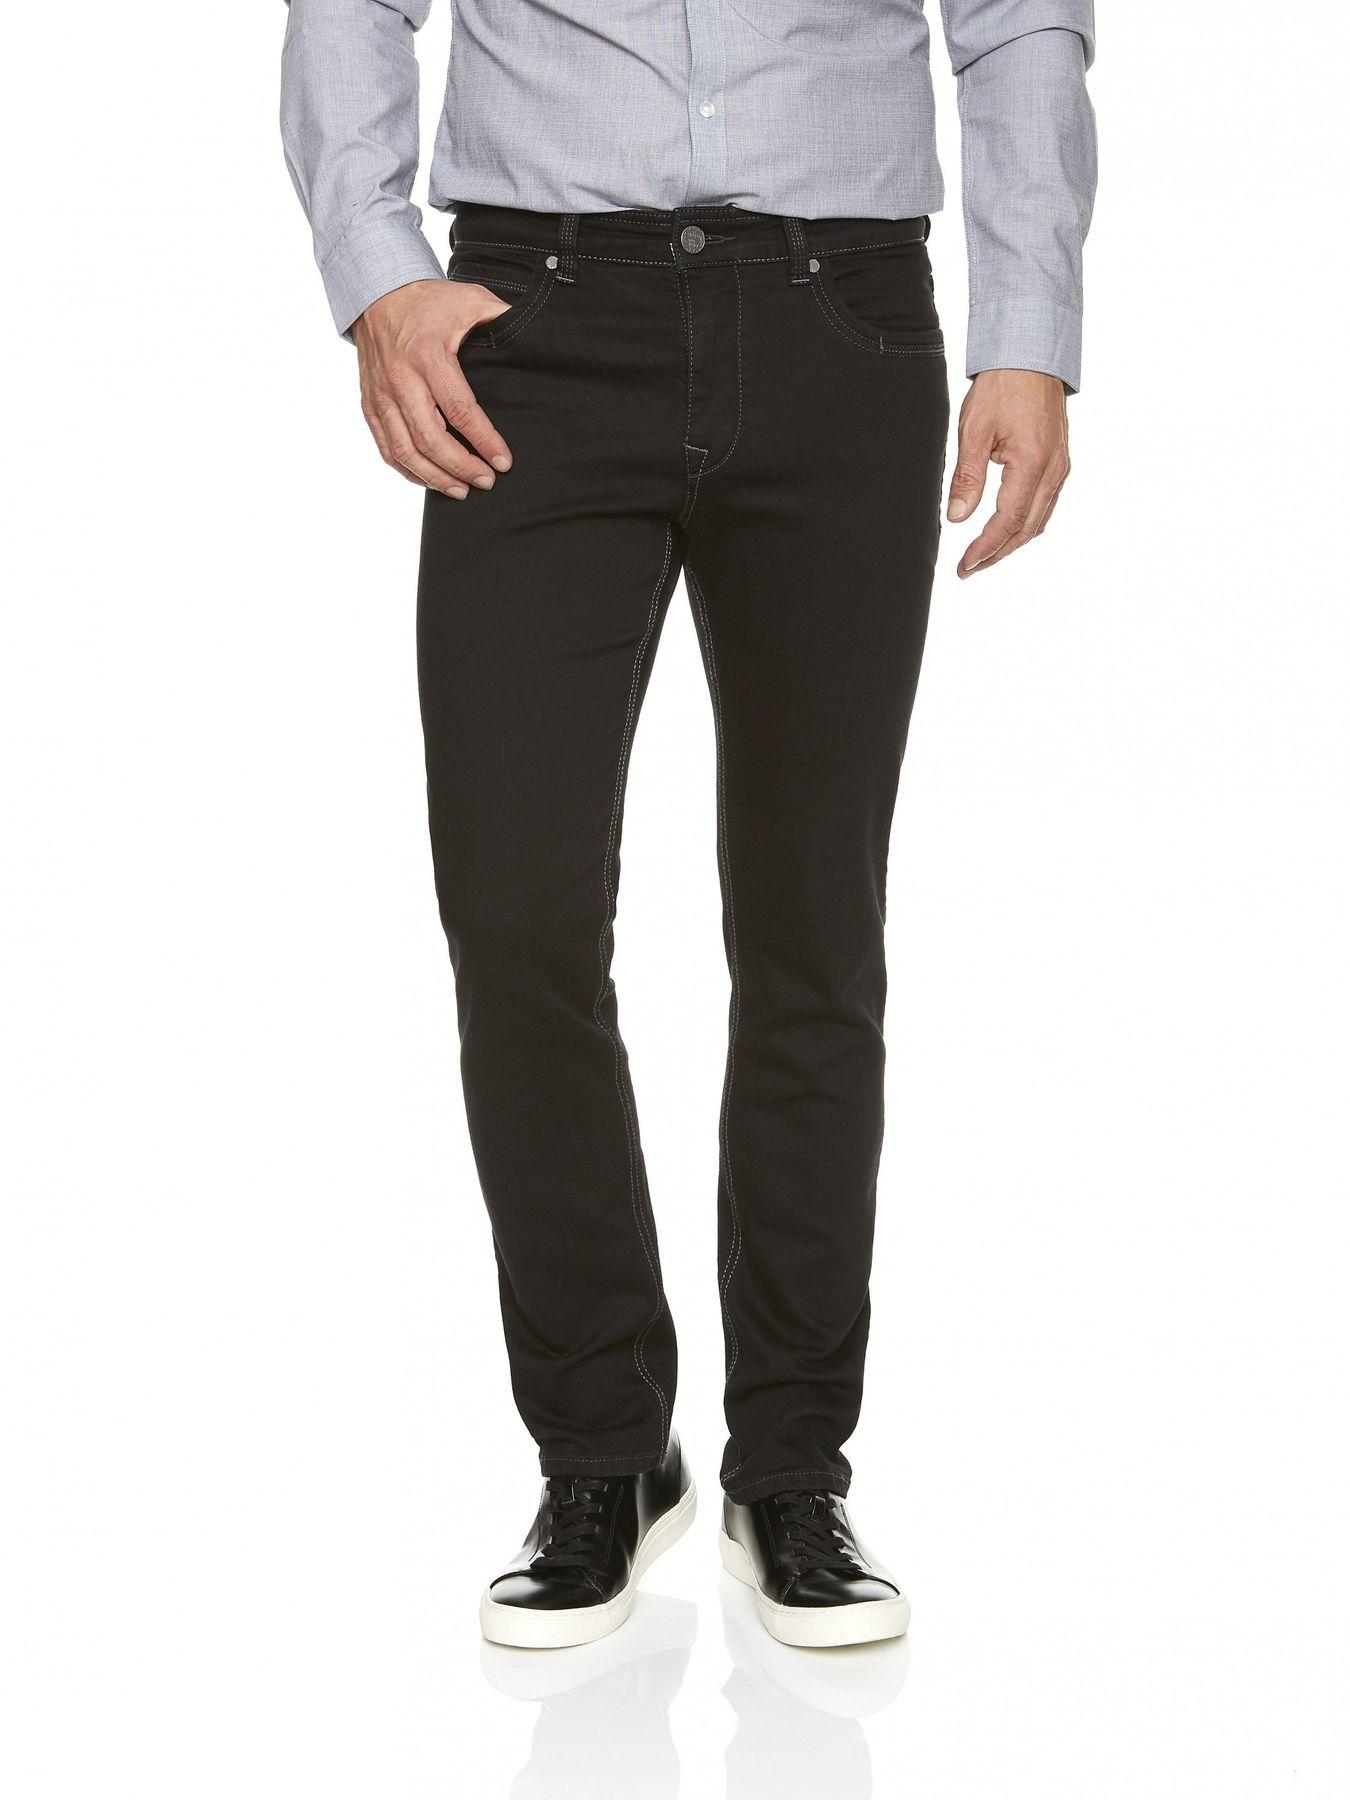 Atelier Gardeur - Herren 5-Pocket Jeans Superflex, Farben black(99), dark stone(68), stone blue(67), anthrazit(198) BATU (71001) – Bild 11